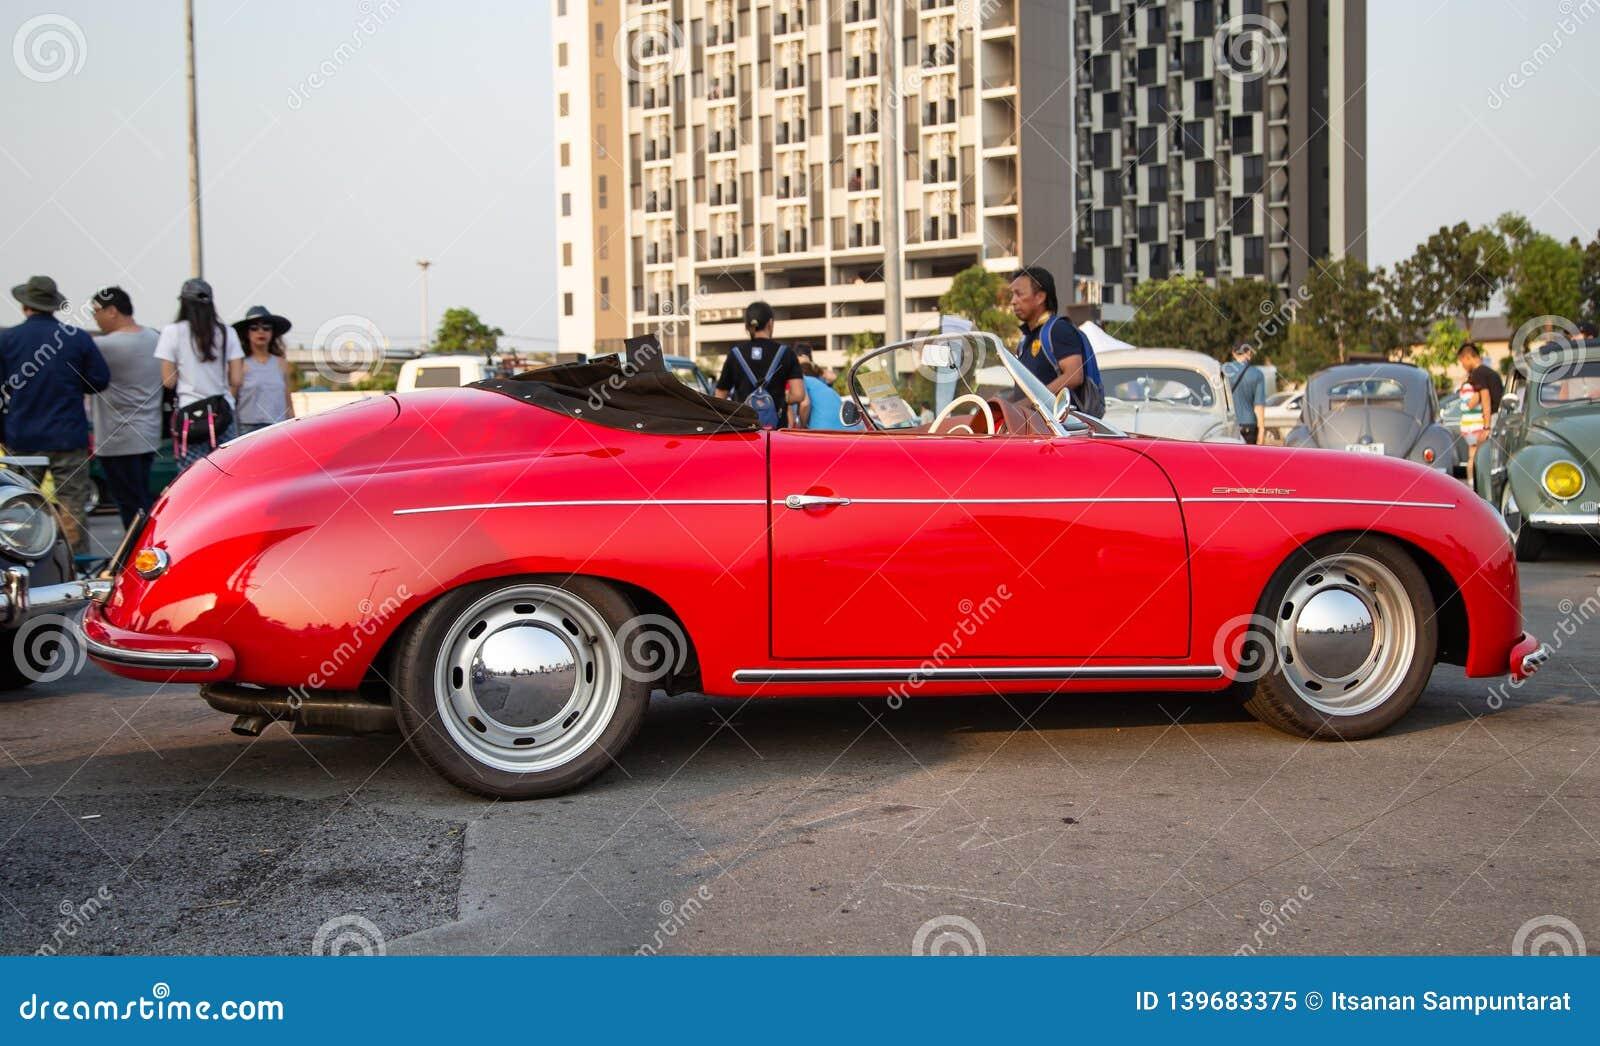 196 Vintage Porsche Convertible Photos Free Royalty Free Stock Photos From Dreamstime